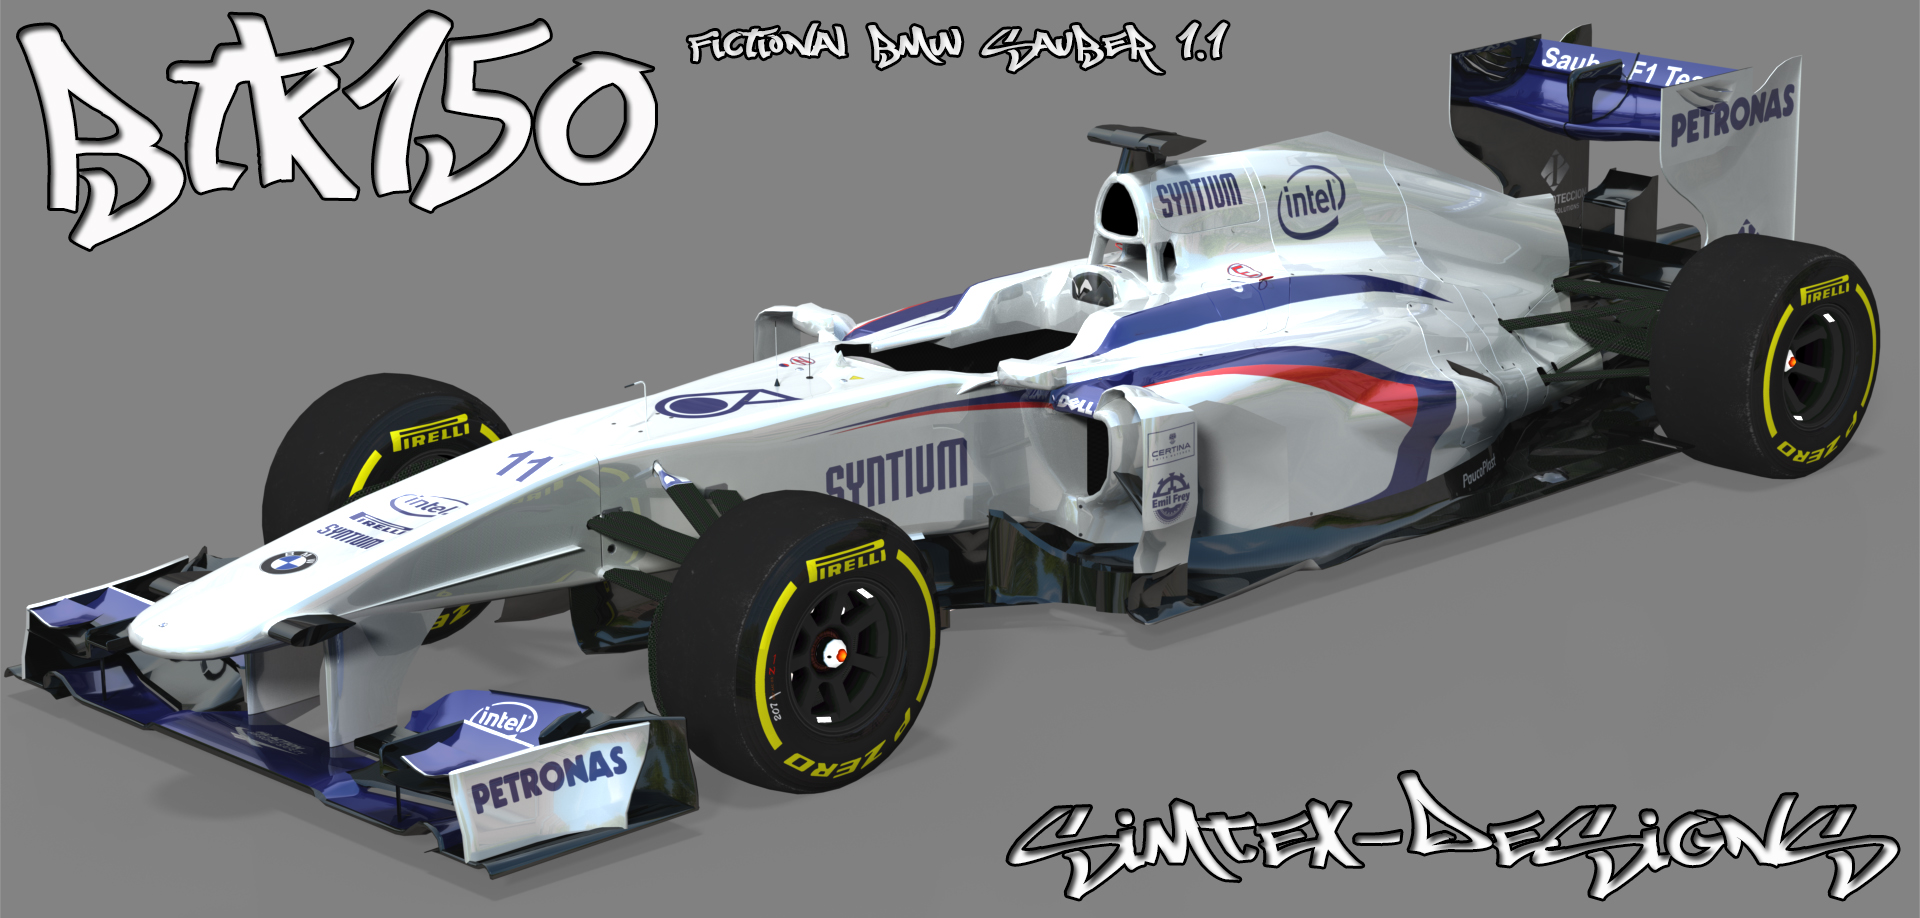 Fictional BMW Sauber 1.1.jpg